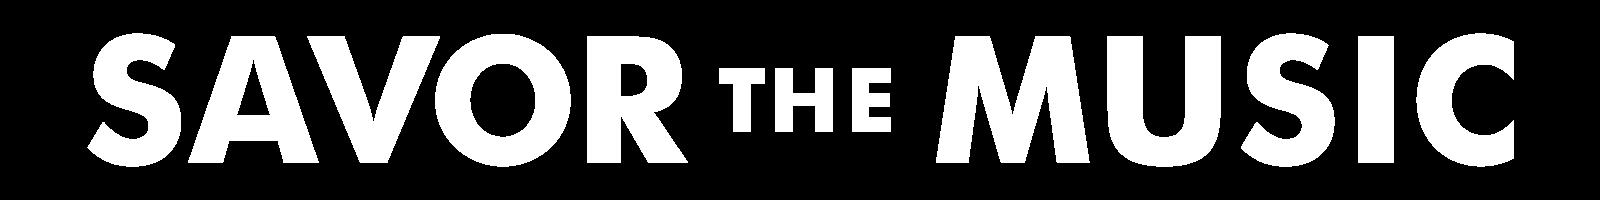 Savor the Music logo